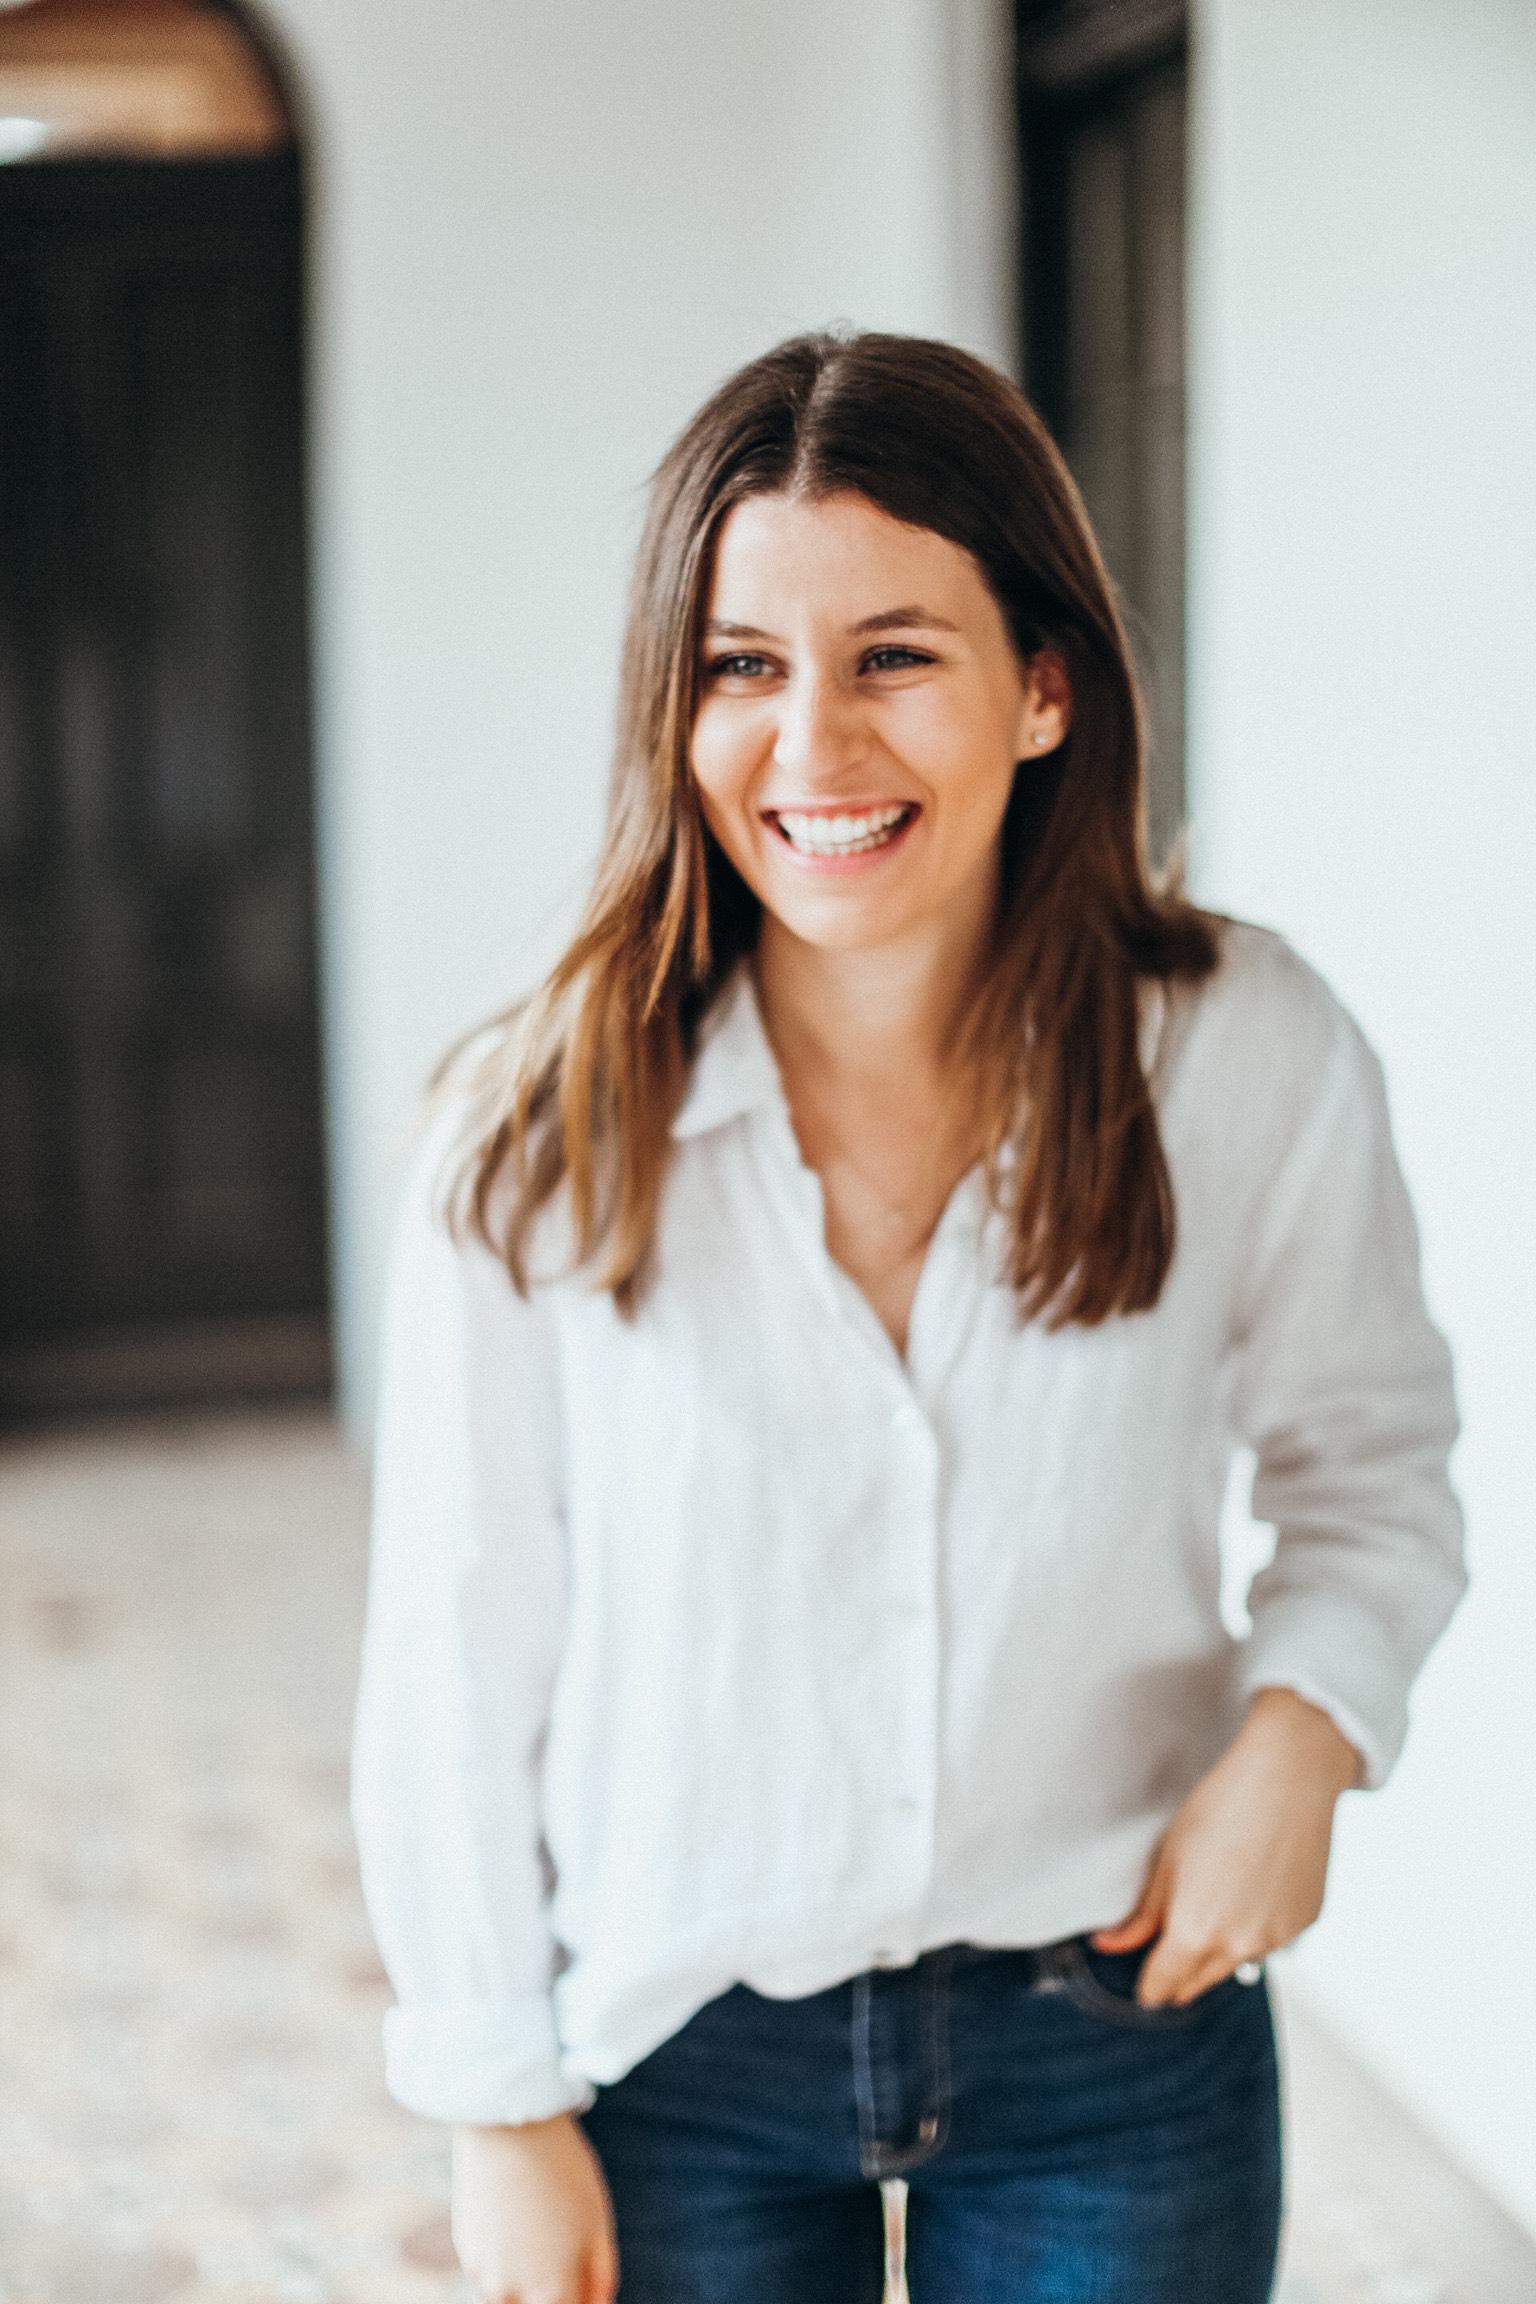 Jillian Kilby - Minna Headshot vertical.jpeg